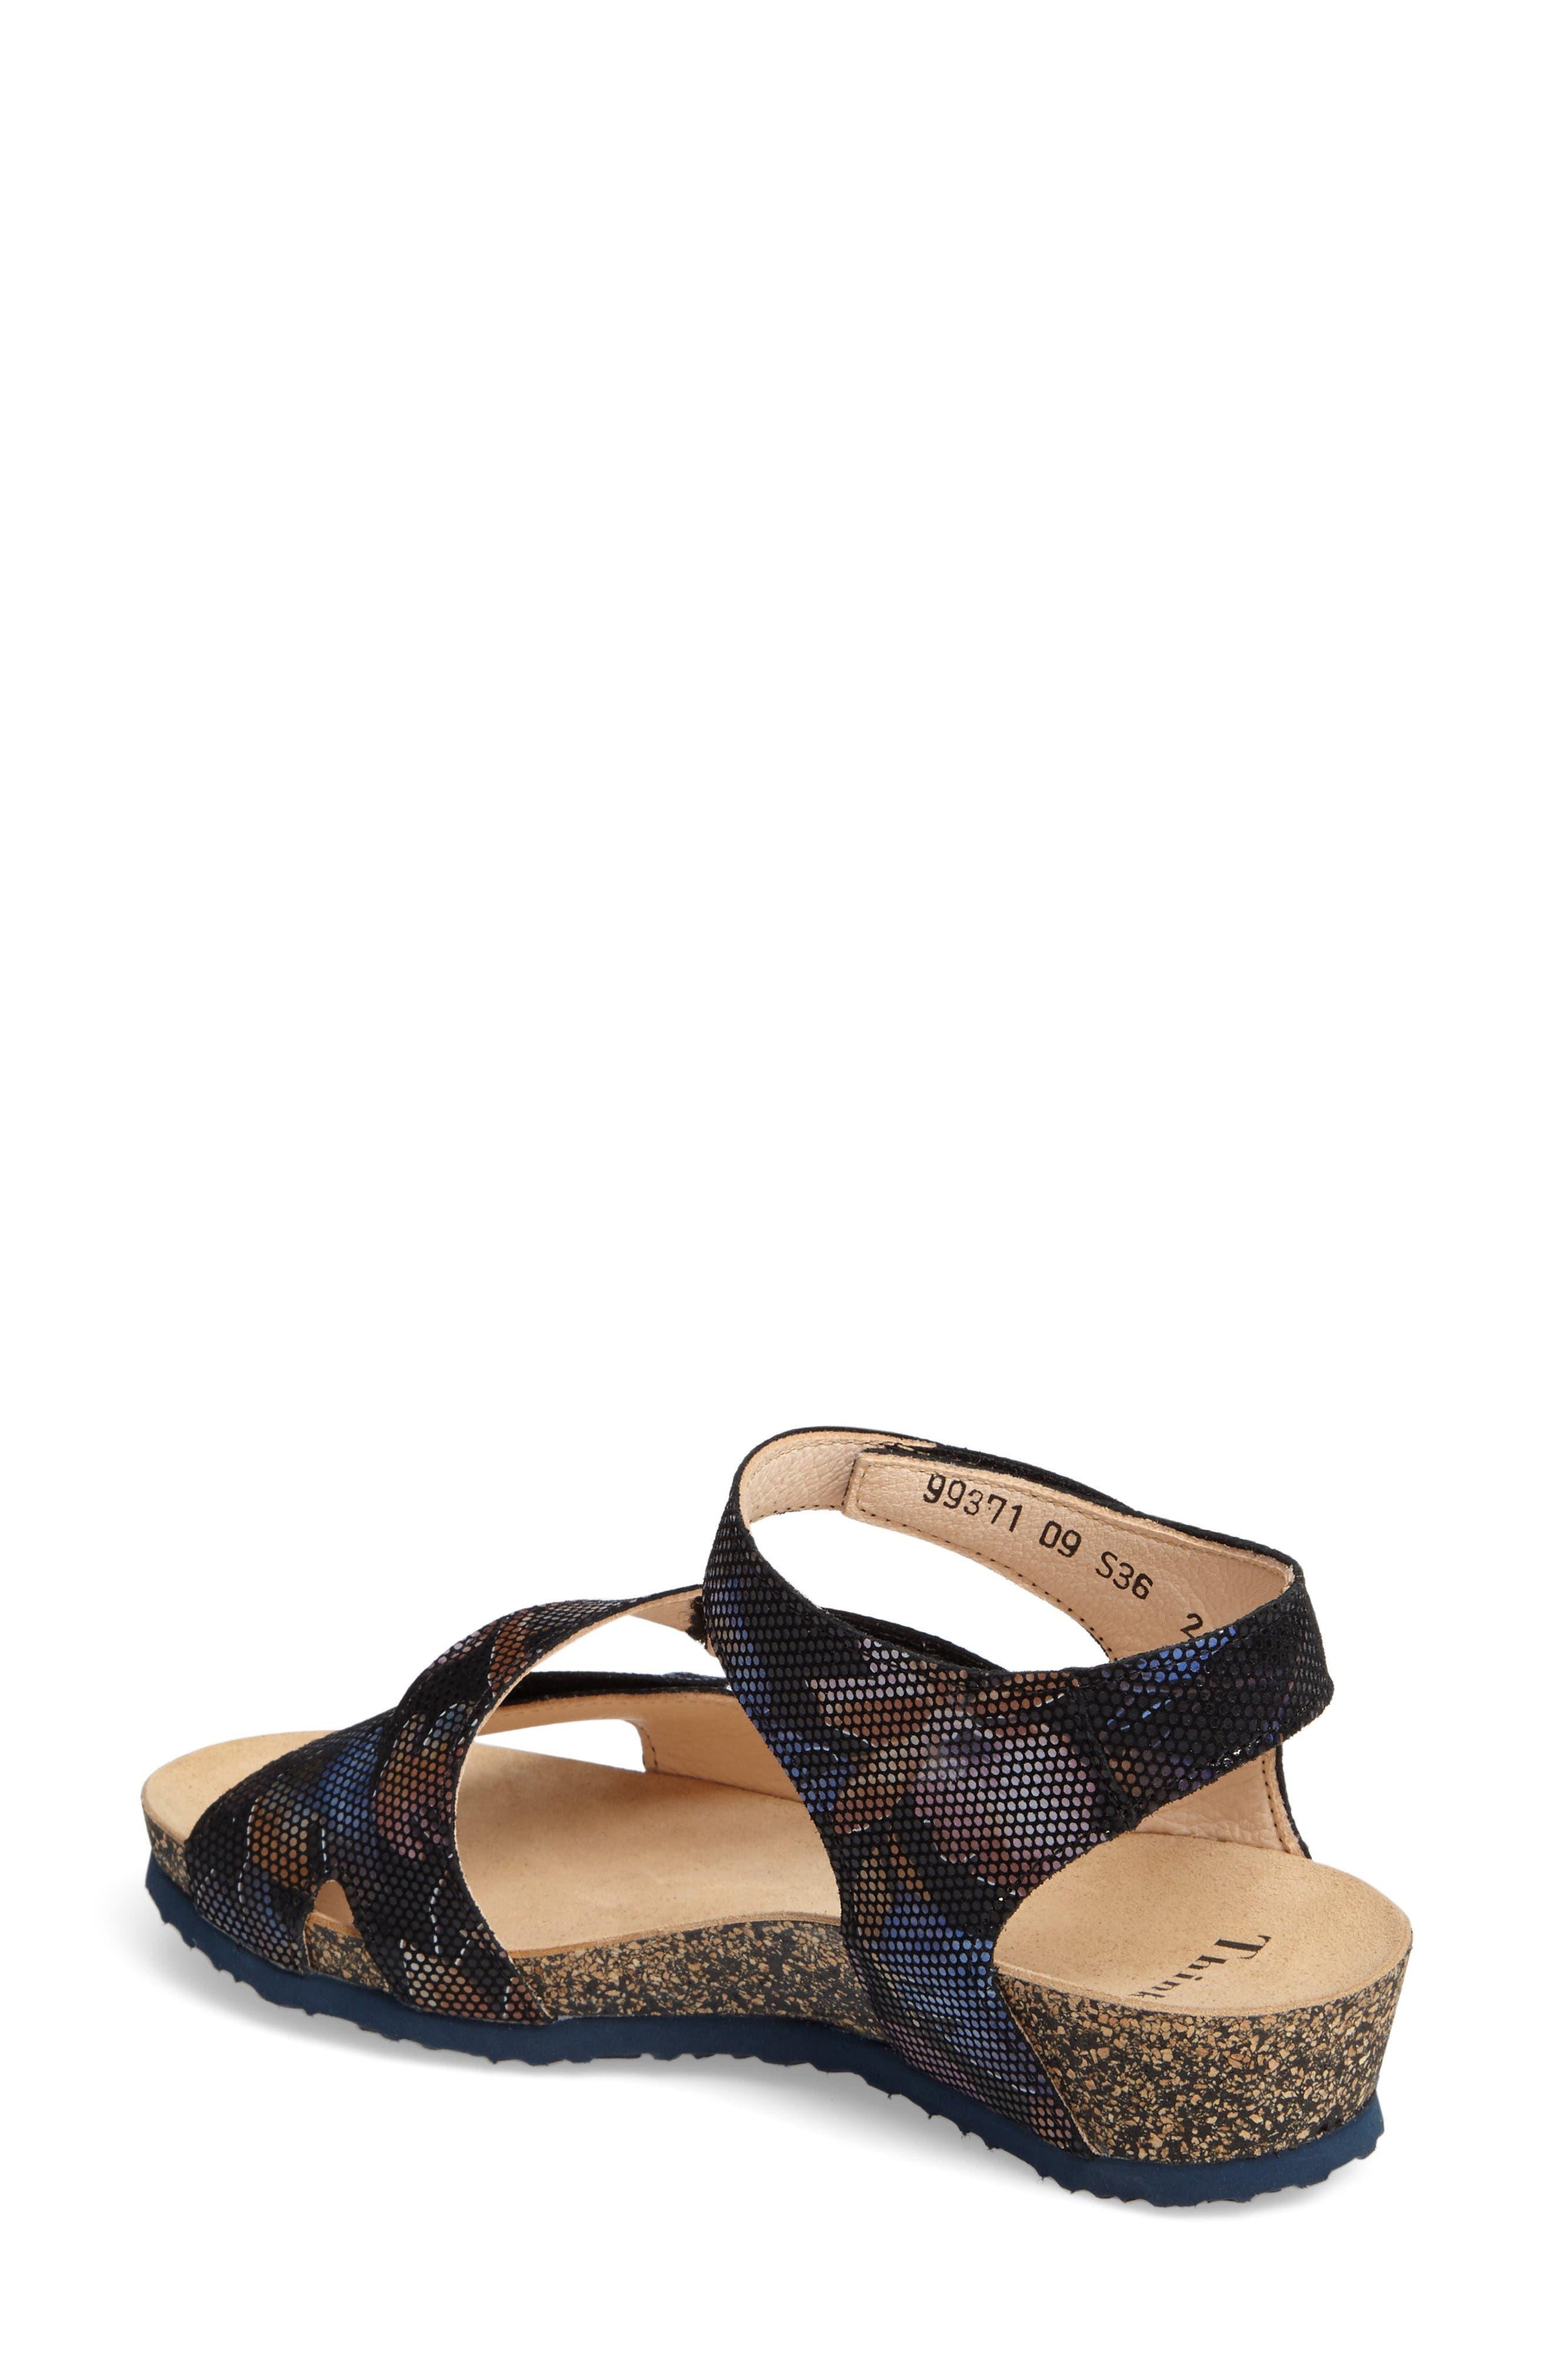 Alternate Image 2  - Think! 'Dumia' Three Strap Sandal (Online Only)